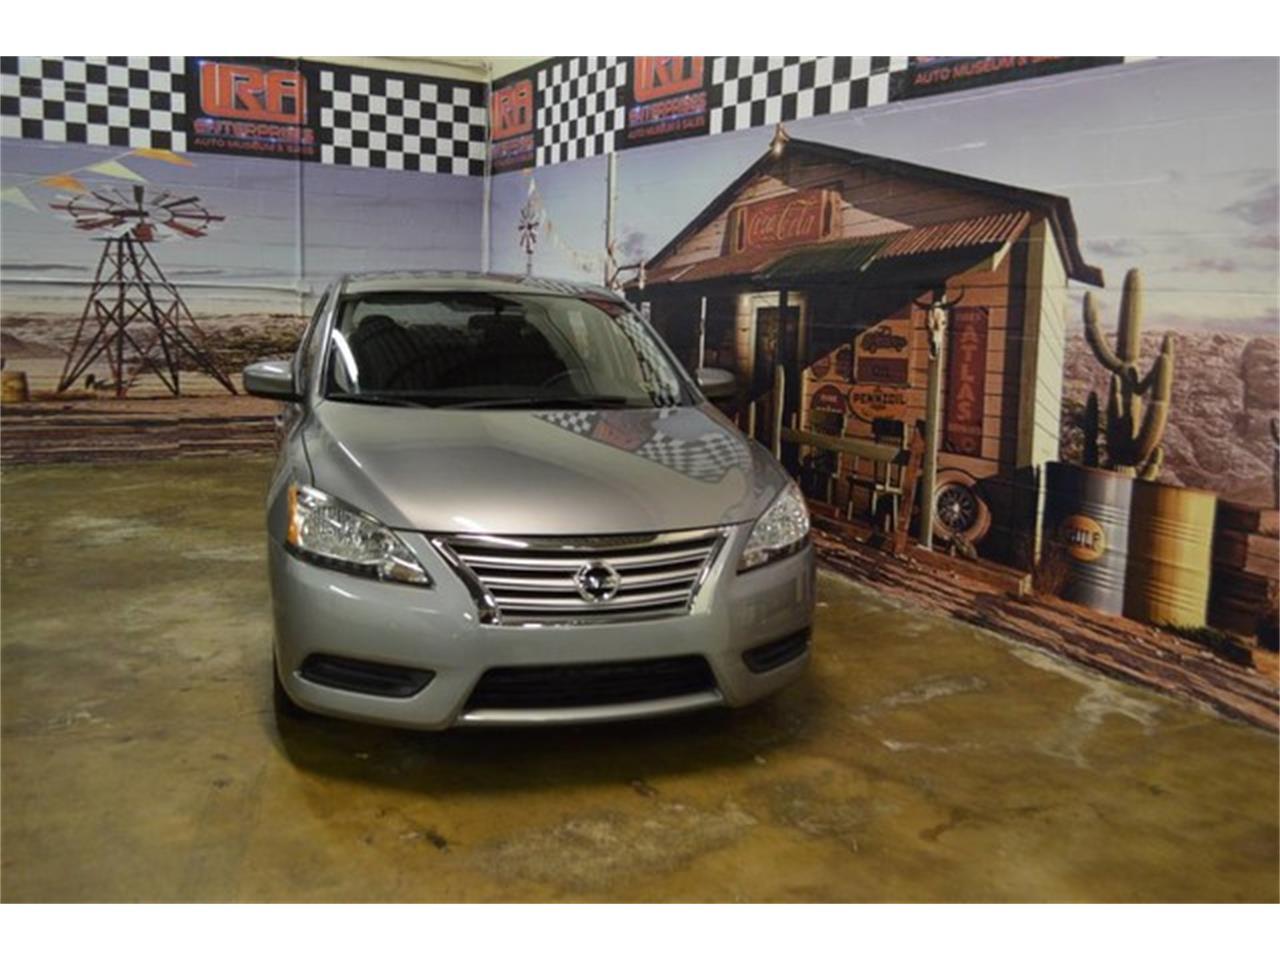 2013 Nissan Sentra (CC-1343844) for sale in Bristol, Pennsylvania